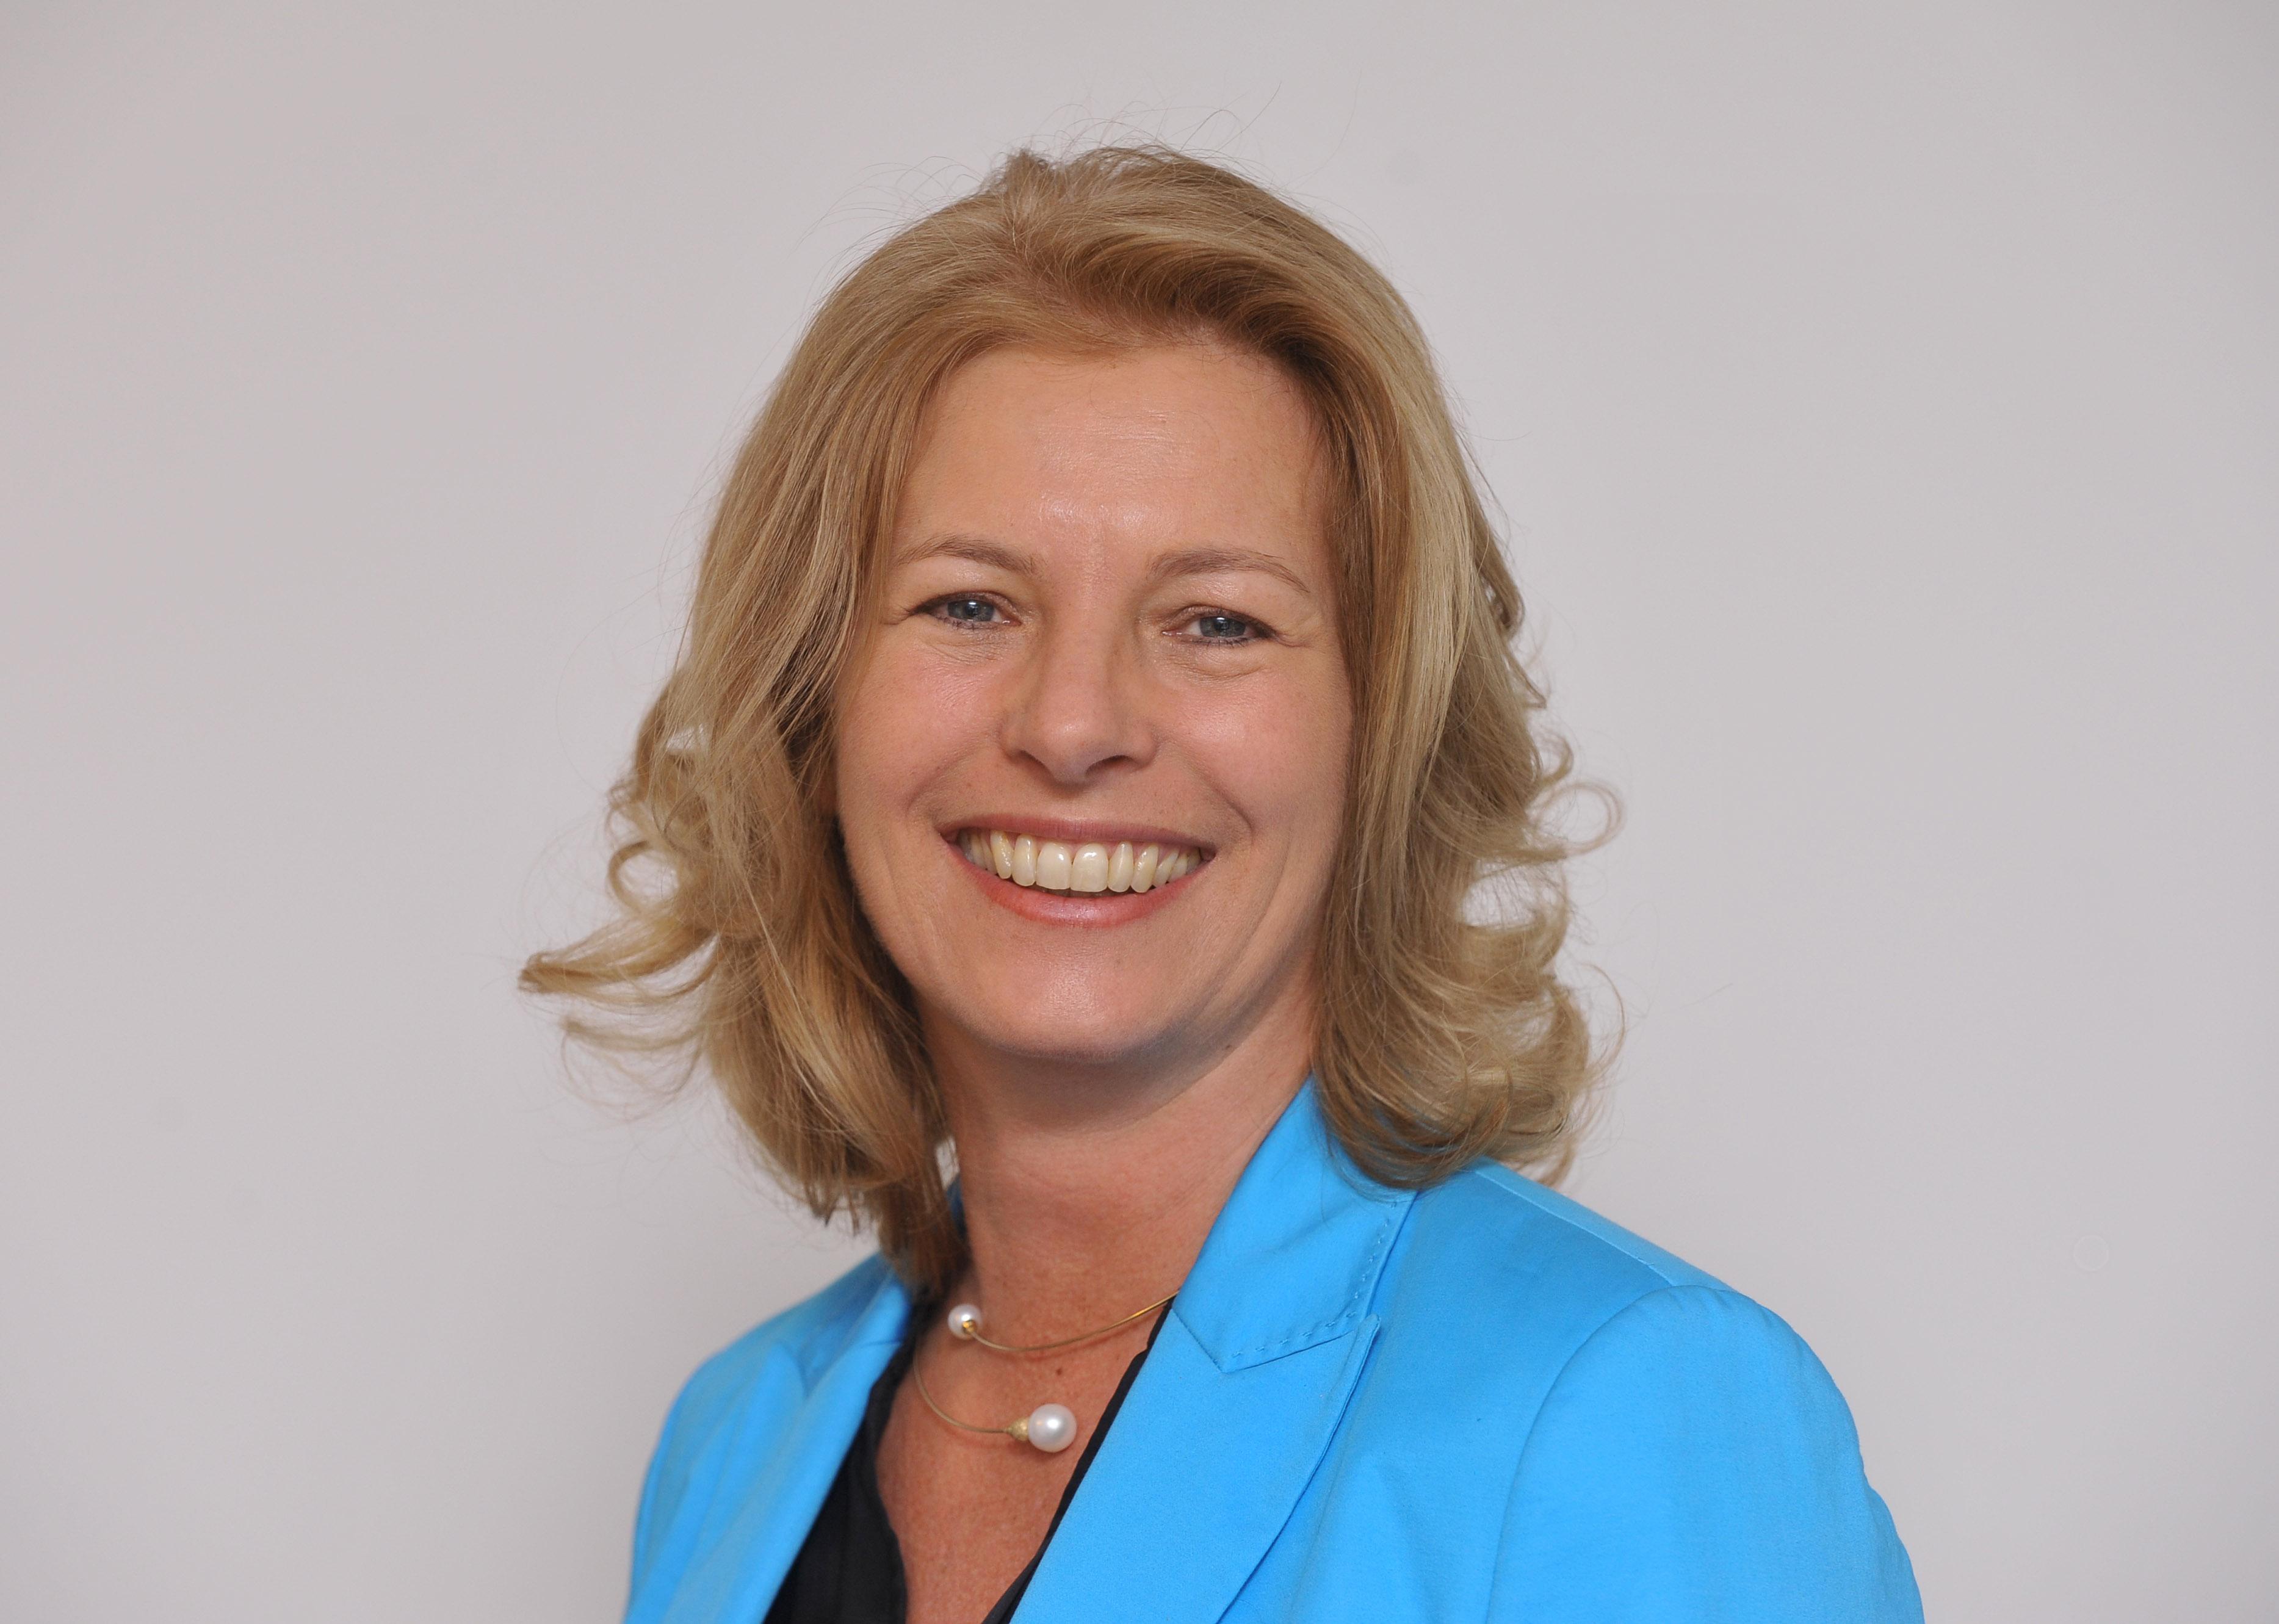 Kommunikationsexpertin-Anja-Oser-bei-GABAL